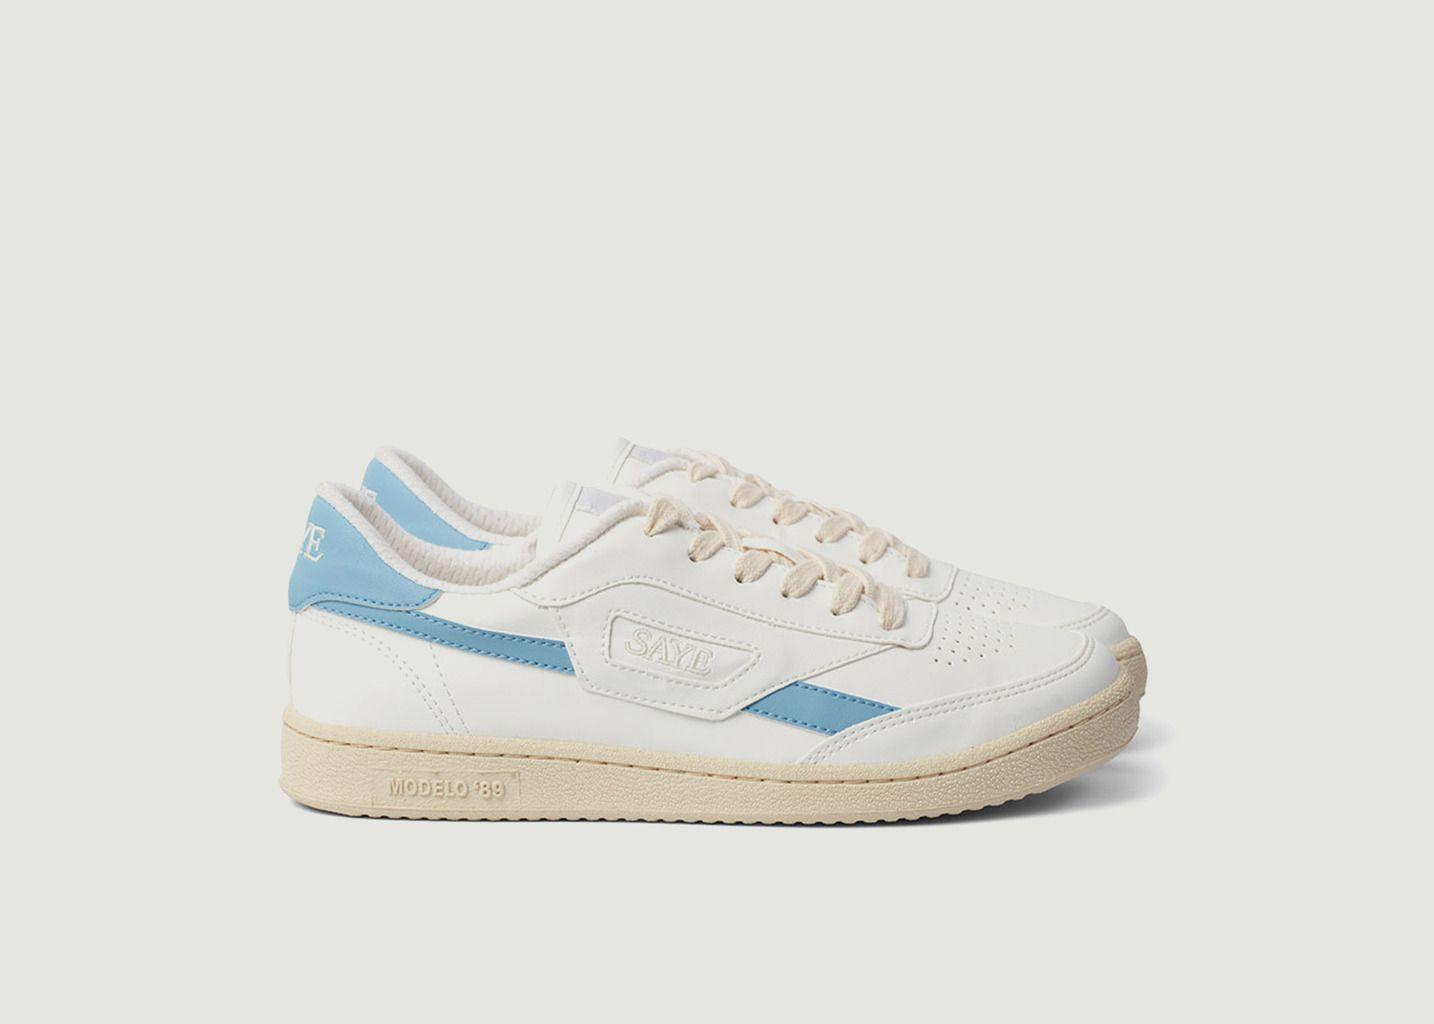 Baskets Modelo 89' azul - Saye